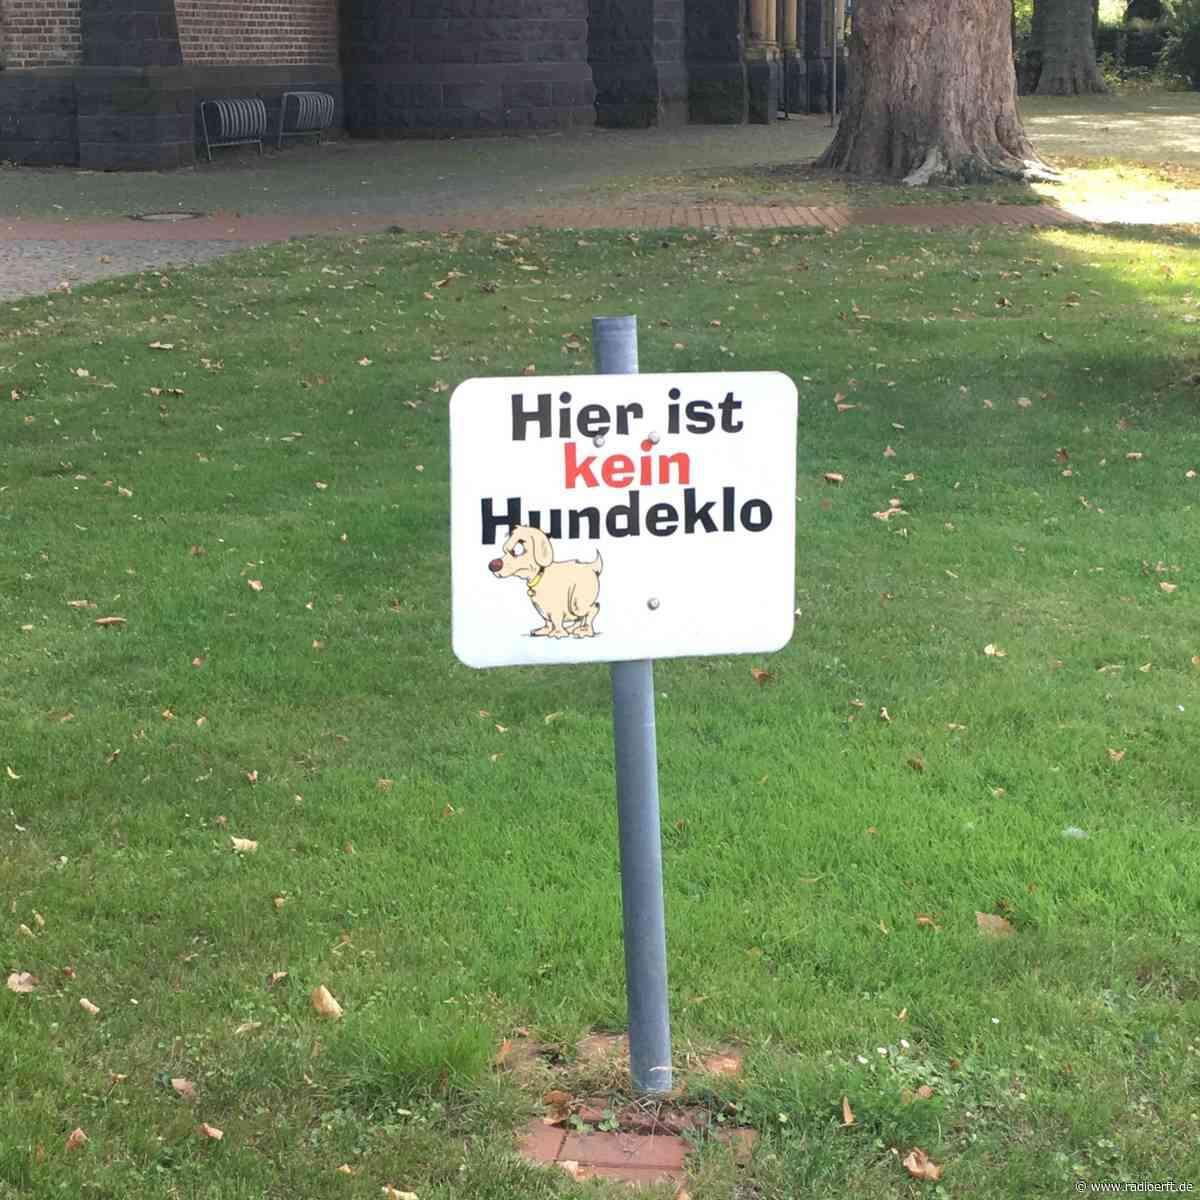 Verschmutzte Spielplätze in Wesseling - radioerft.de